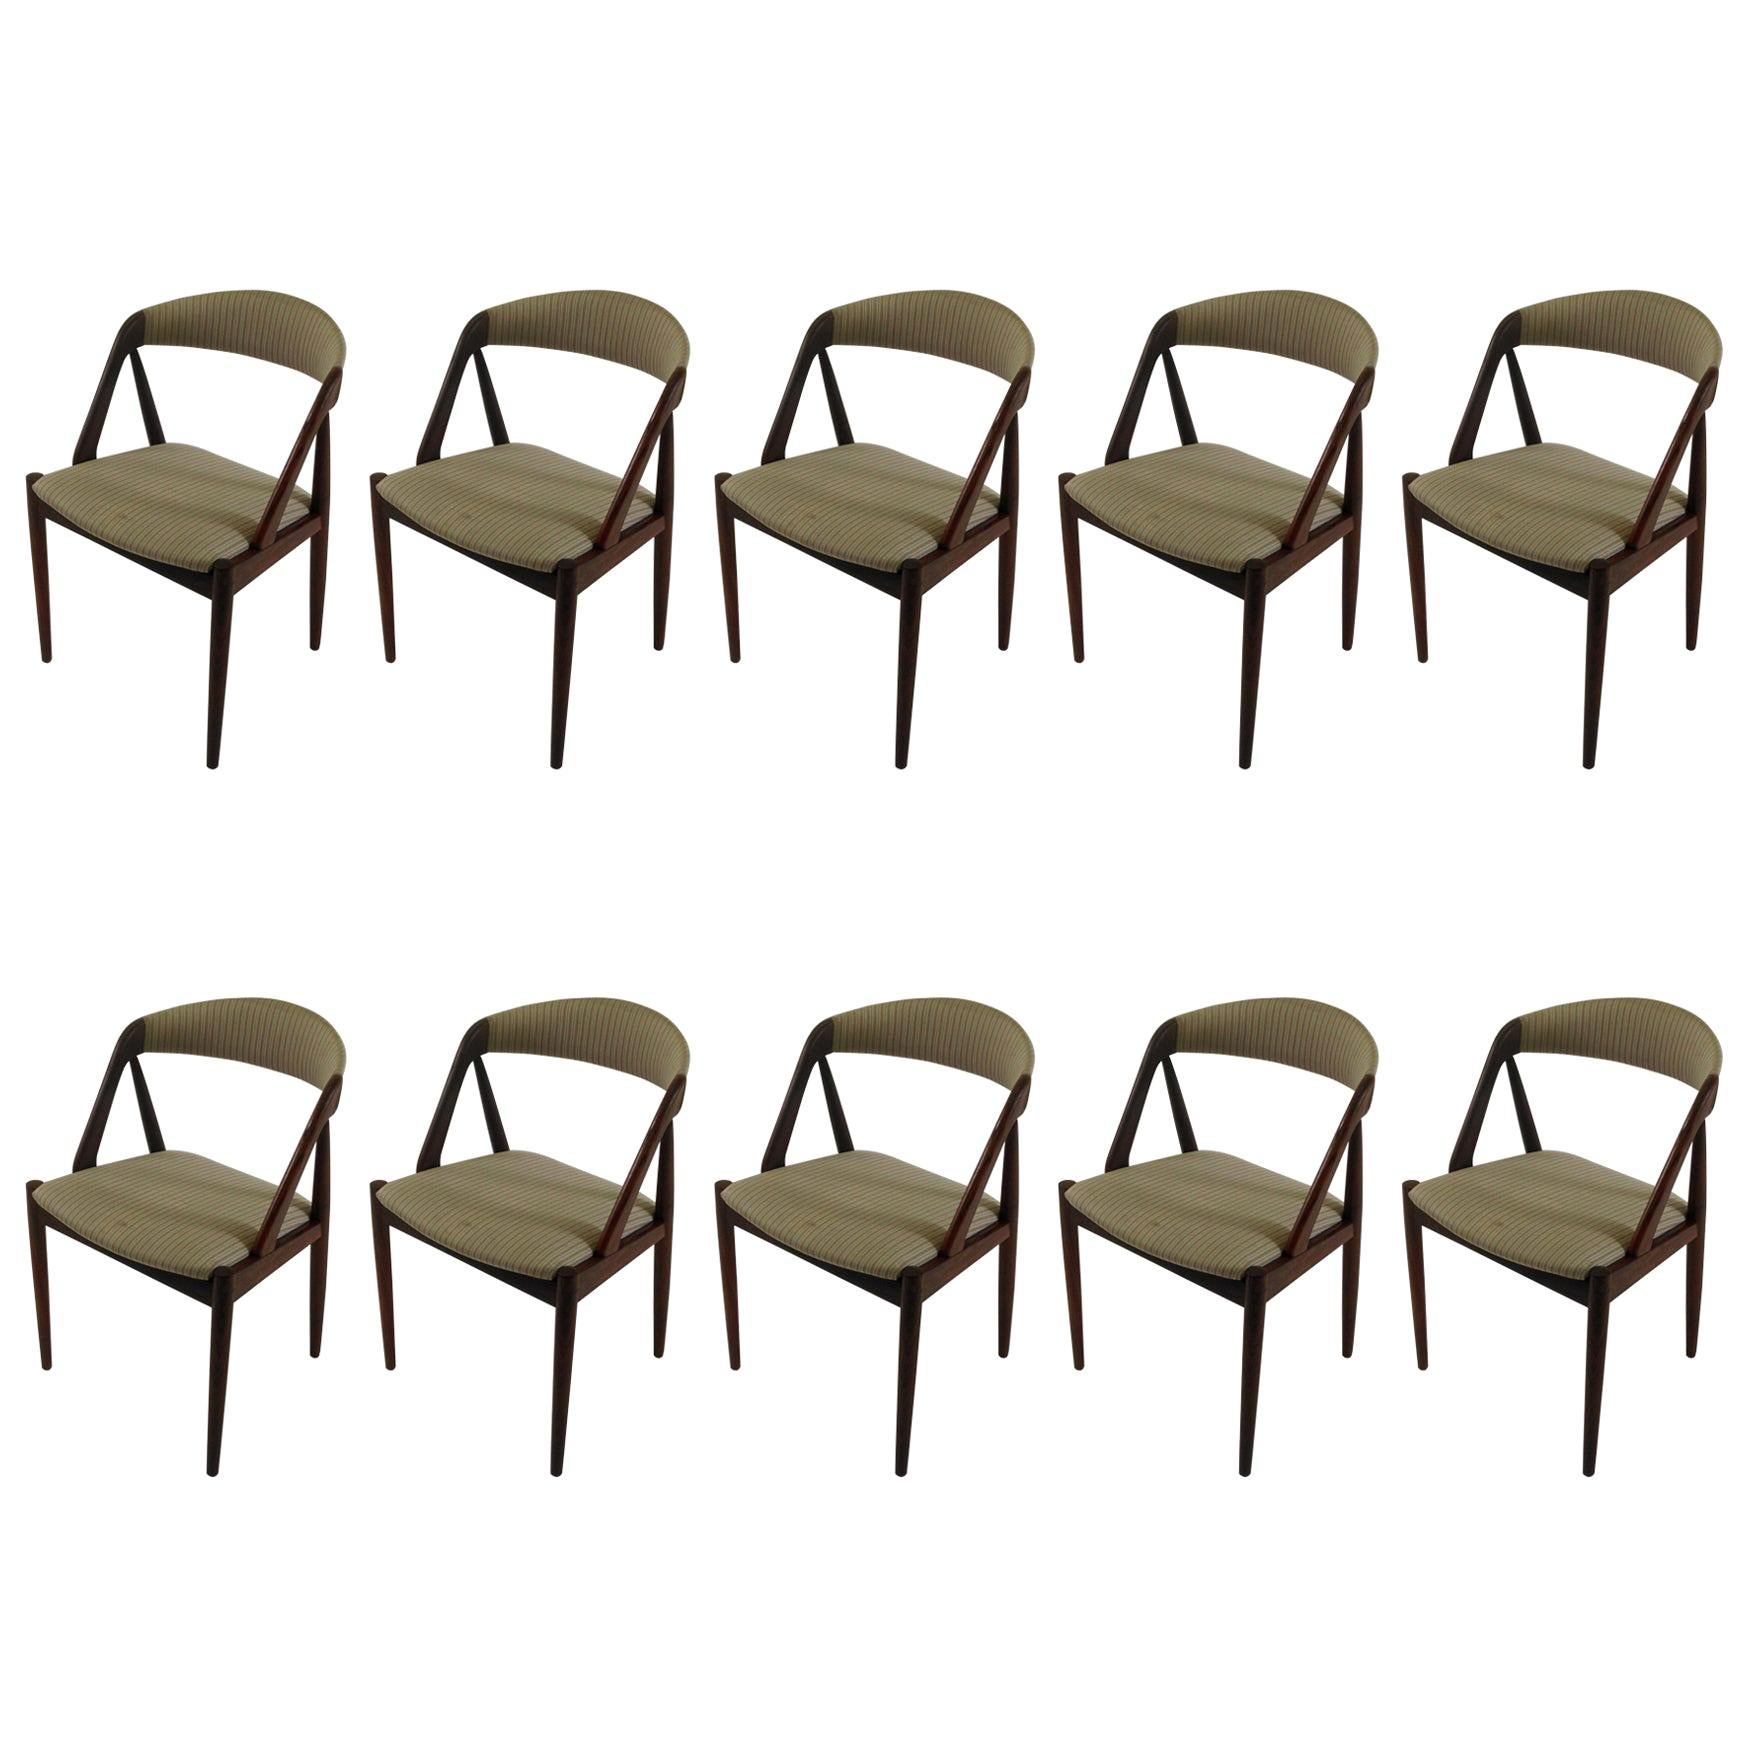 Kai Kristiansen Set of Ten Refinished Teak Dining Chairs, Choice of Upholstery